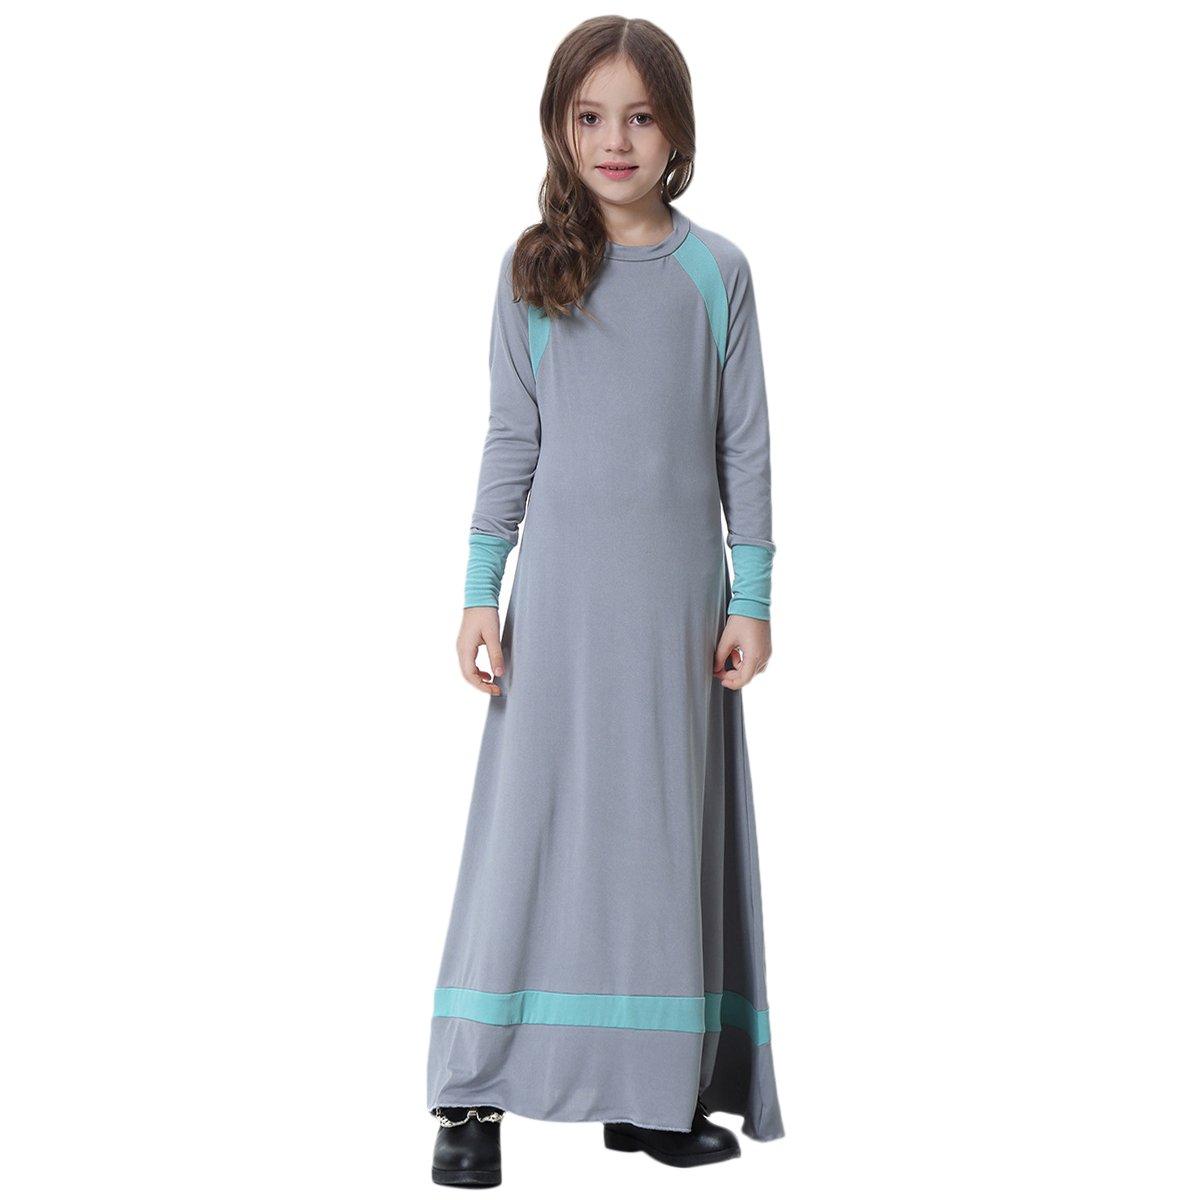 8e1f25ad6ff3b Enfant Fille Robe Musulmane Abaya Islamic Manches Longues Col Rond Robe  Maxi Elegante Moyen-Orient